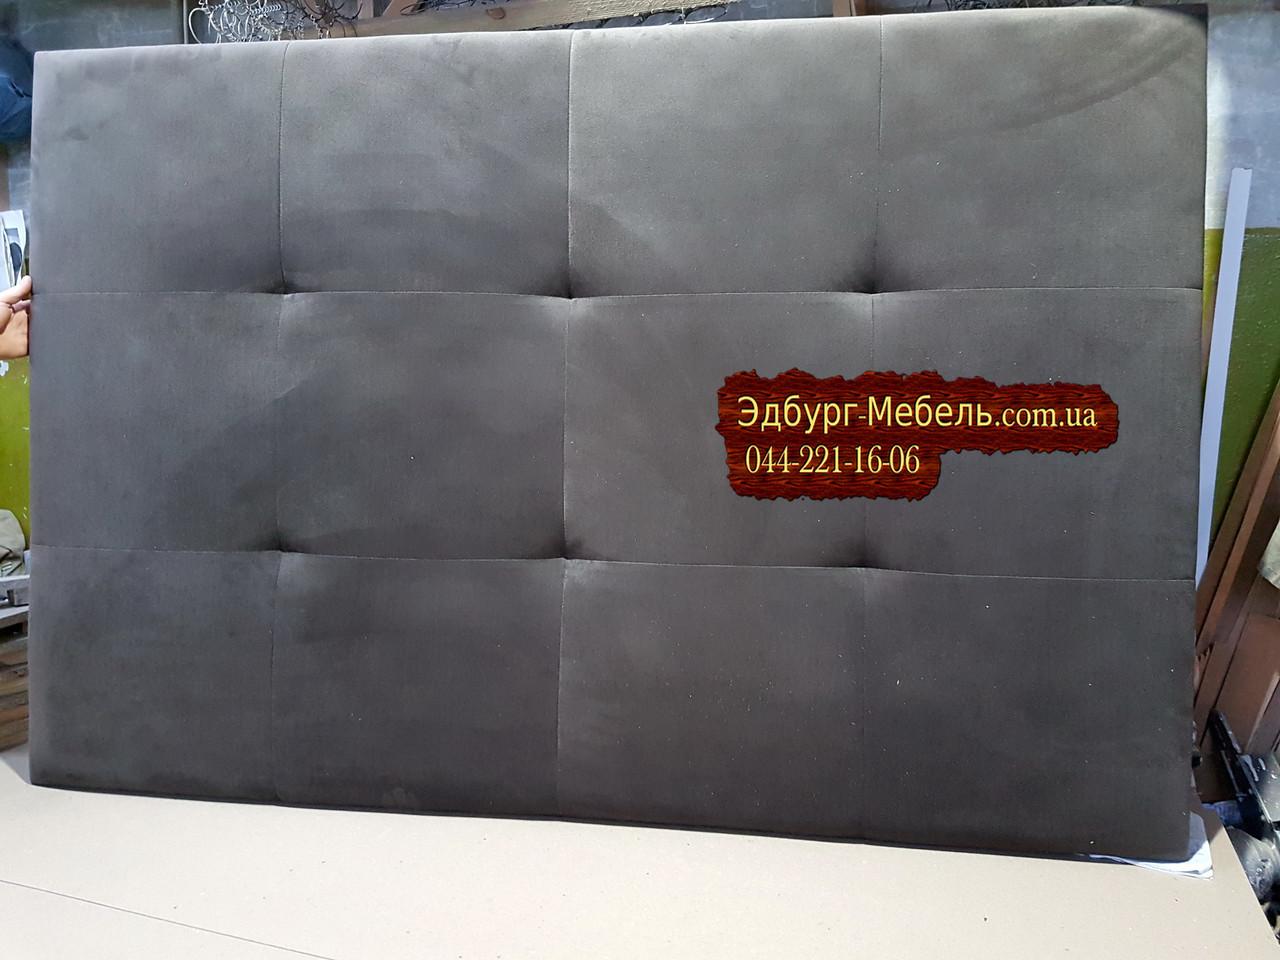 Стеновые панели на заказ